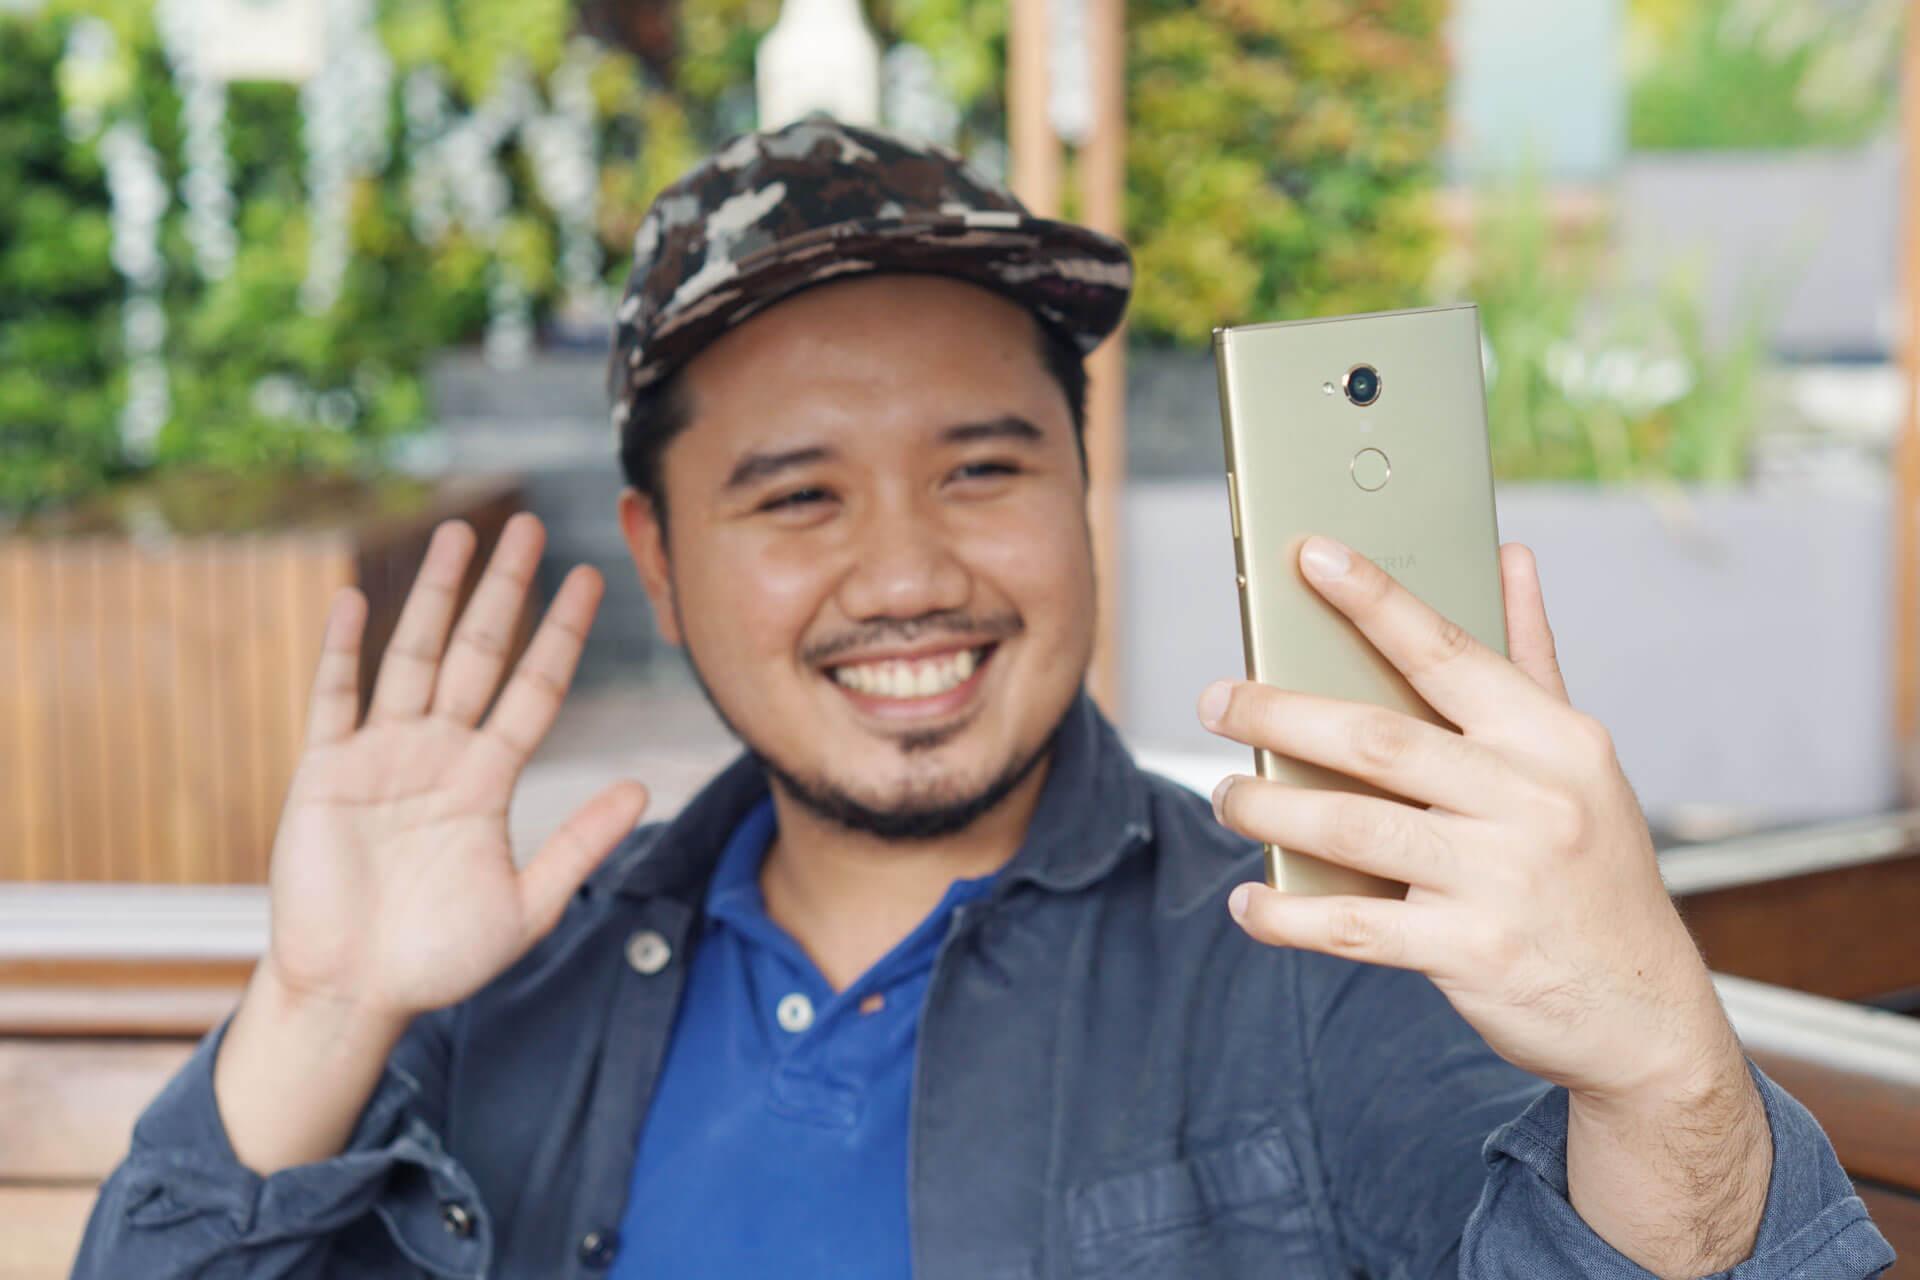 sony xperia xa2 ultra revew selfie